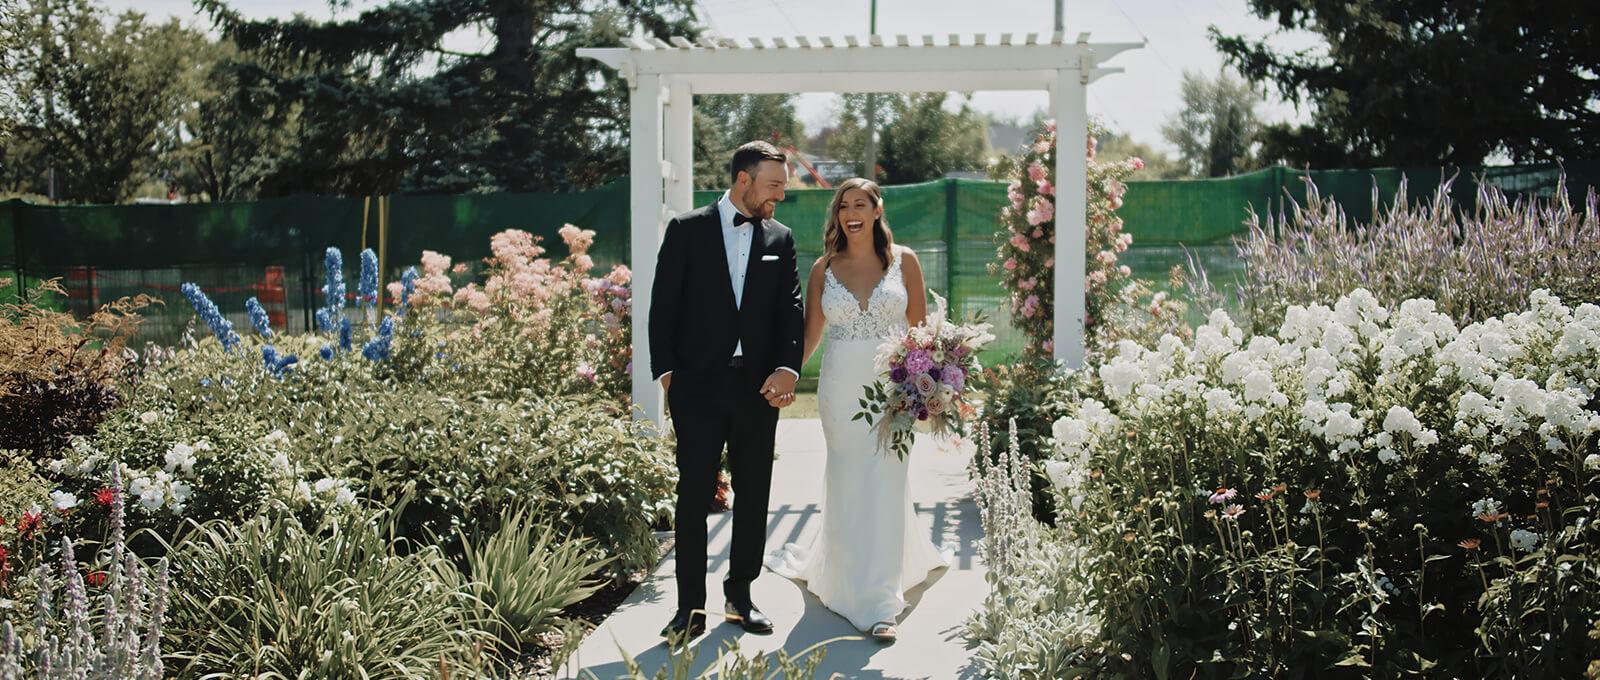 Samantha and Quinn's Calgary wedding film at the Deane House